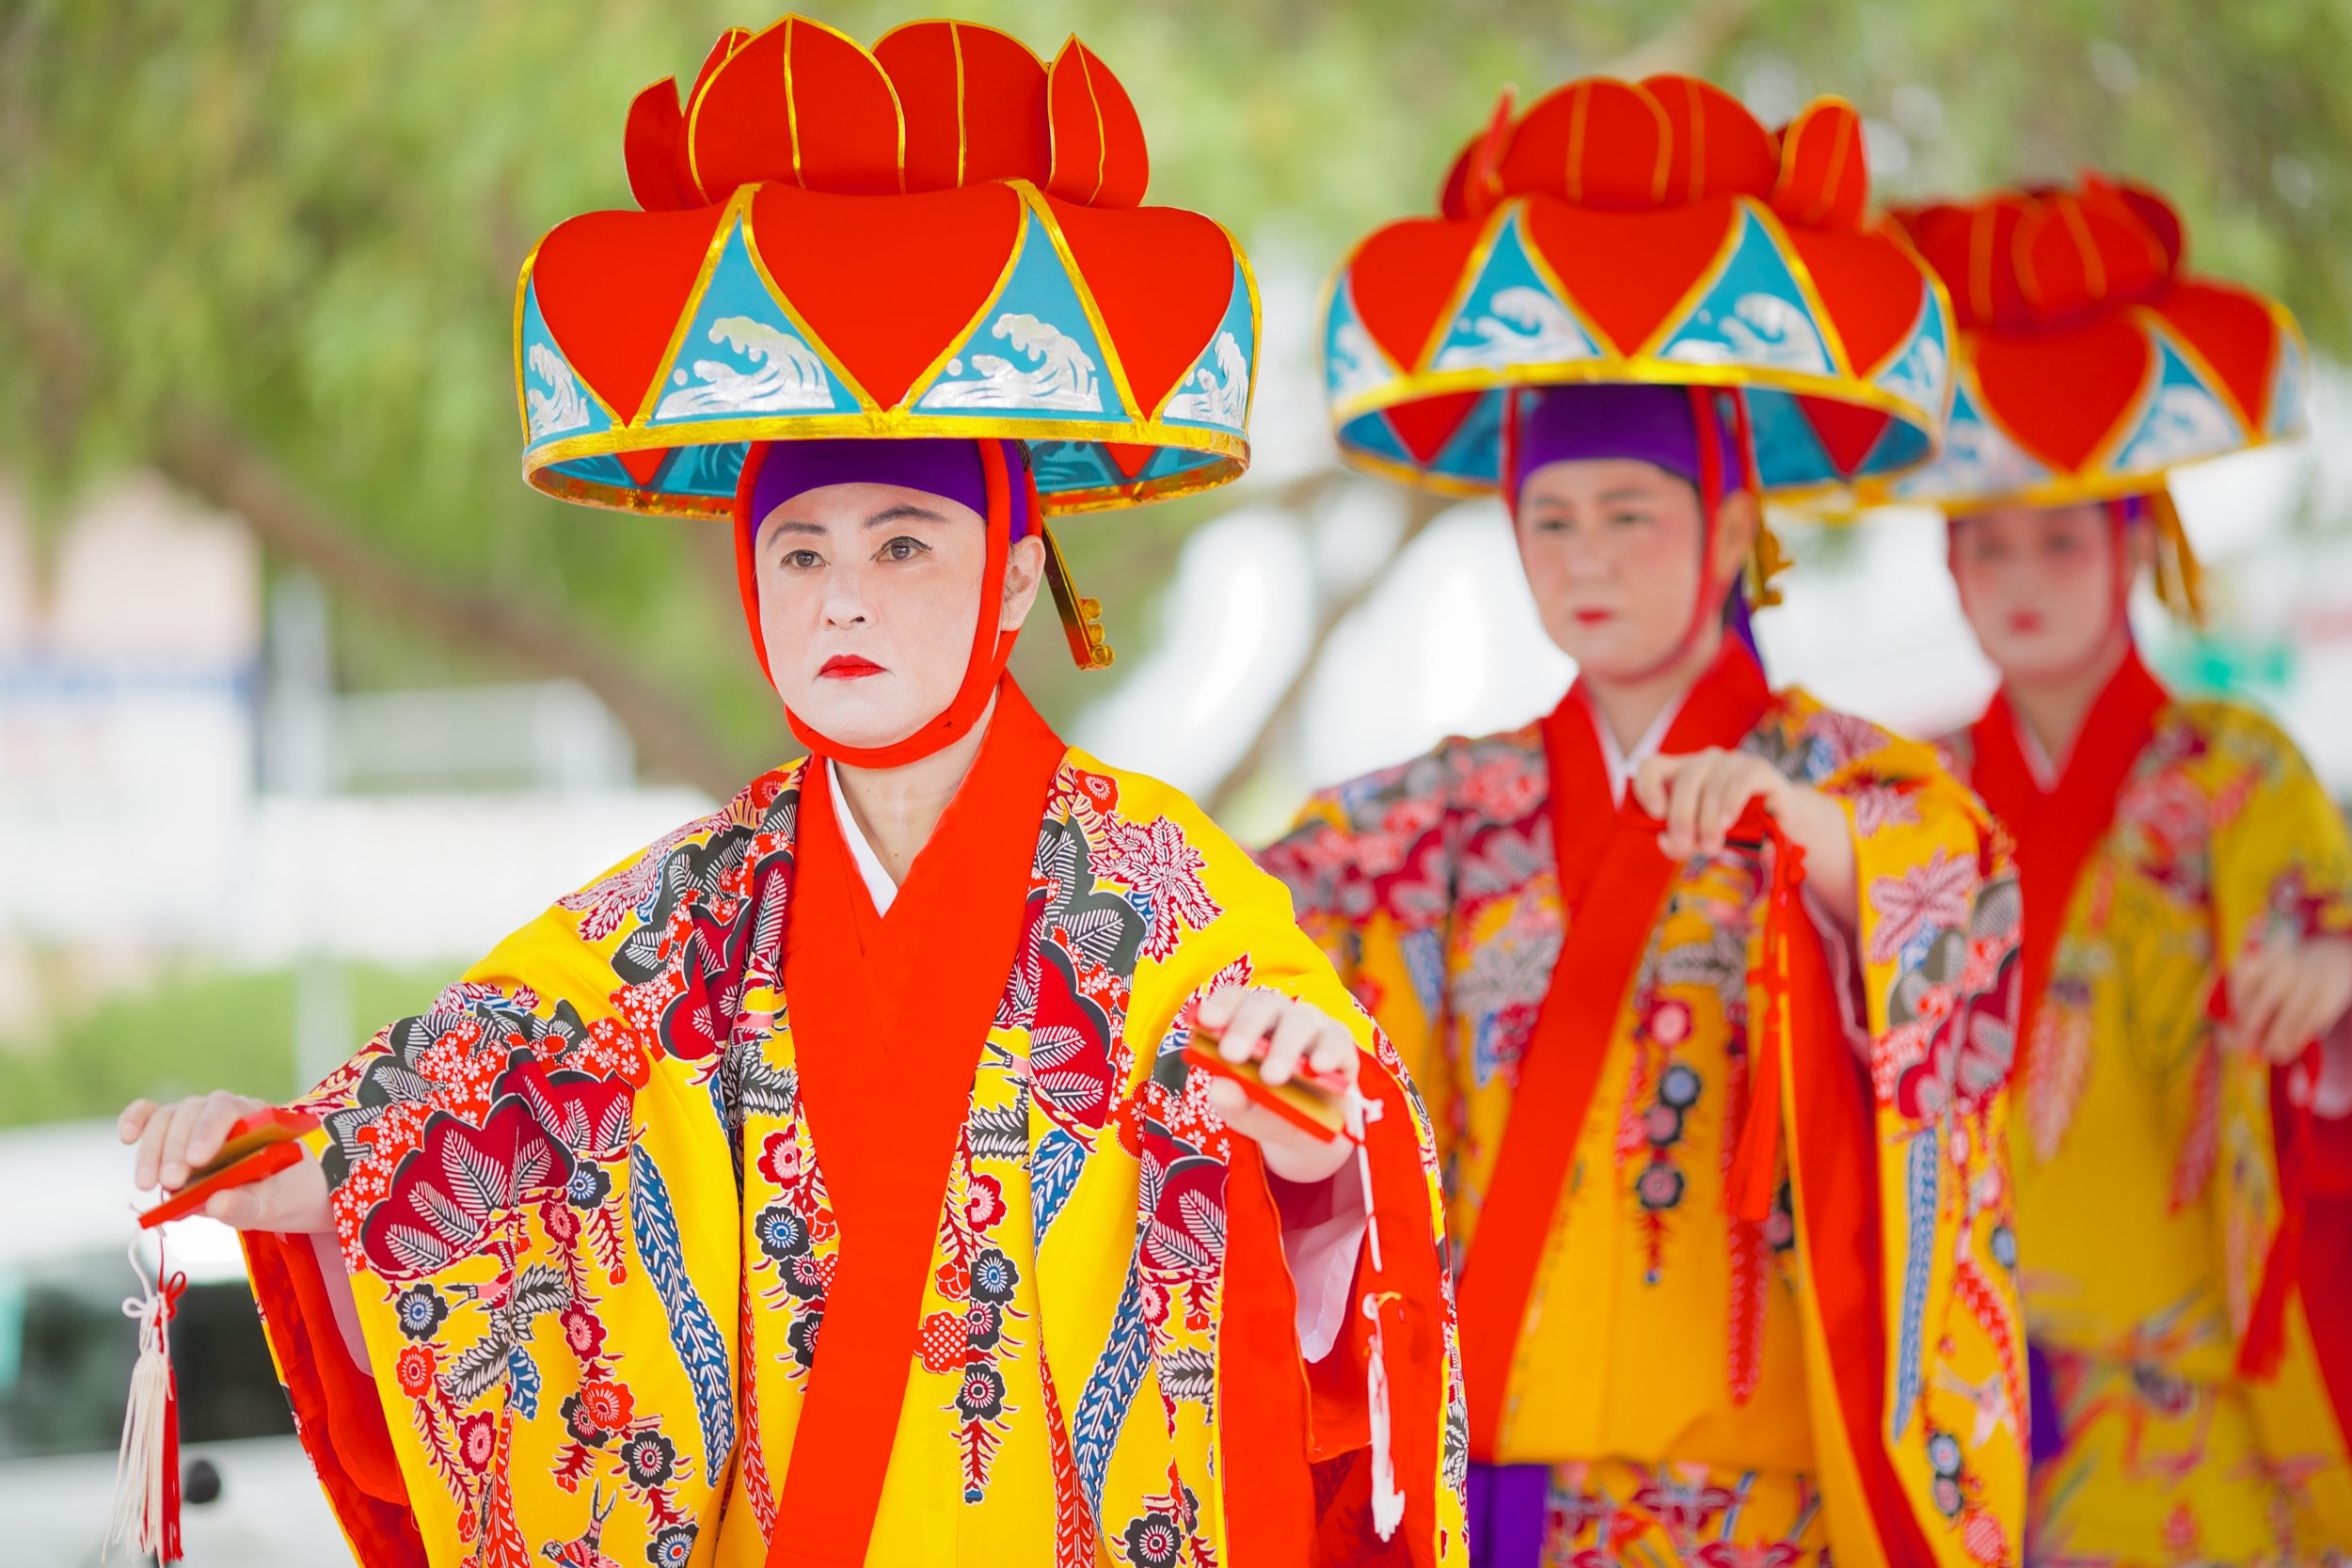 ohtori-no-kai---japanese-cultural-fair-of-santa-cruz-2015_18975739413_o.jpg